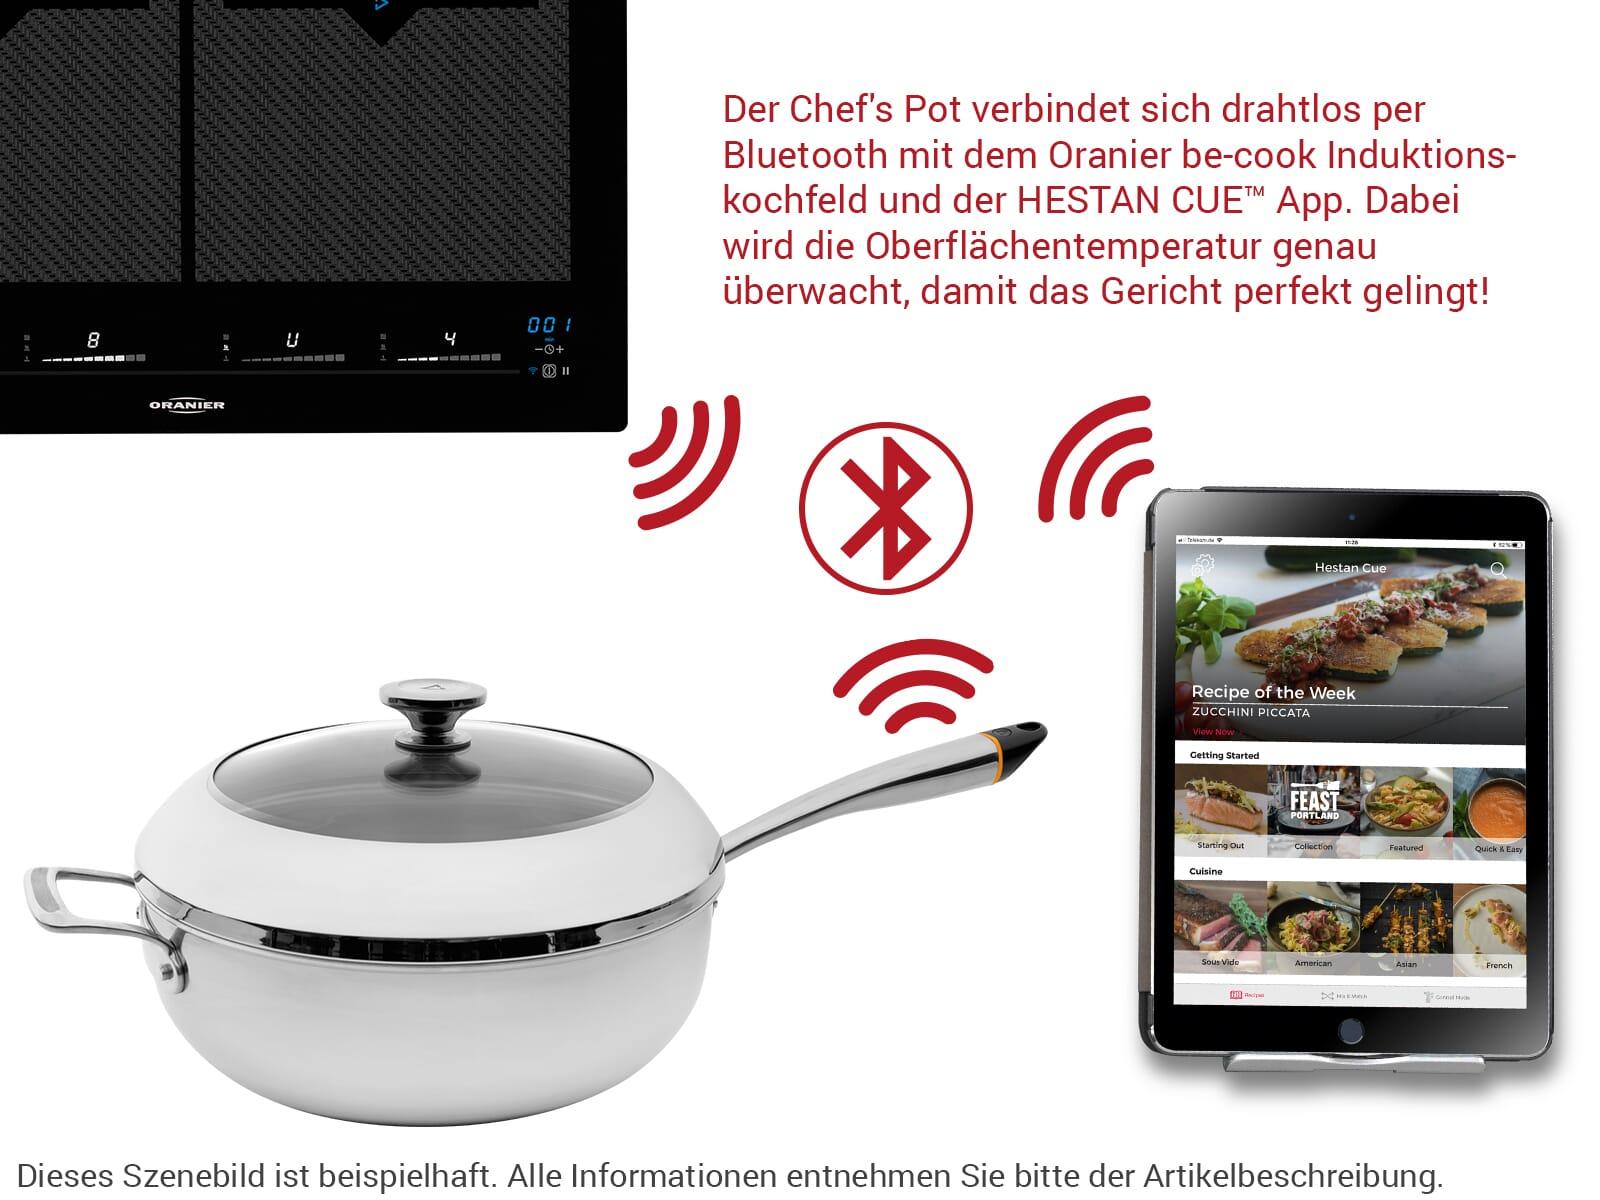 Oranier be-cook SET Chef's Pot 9209 26 + Pfanne 9209 25 + Grill-Platte 9209 11